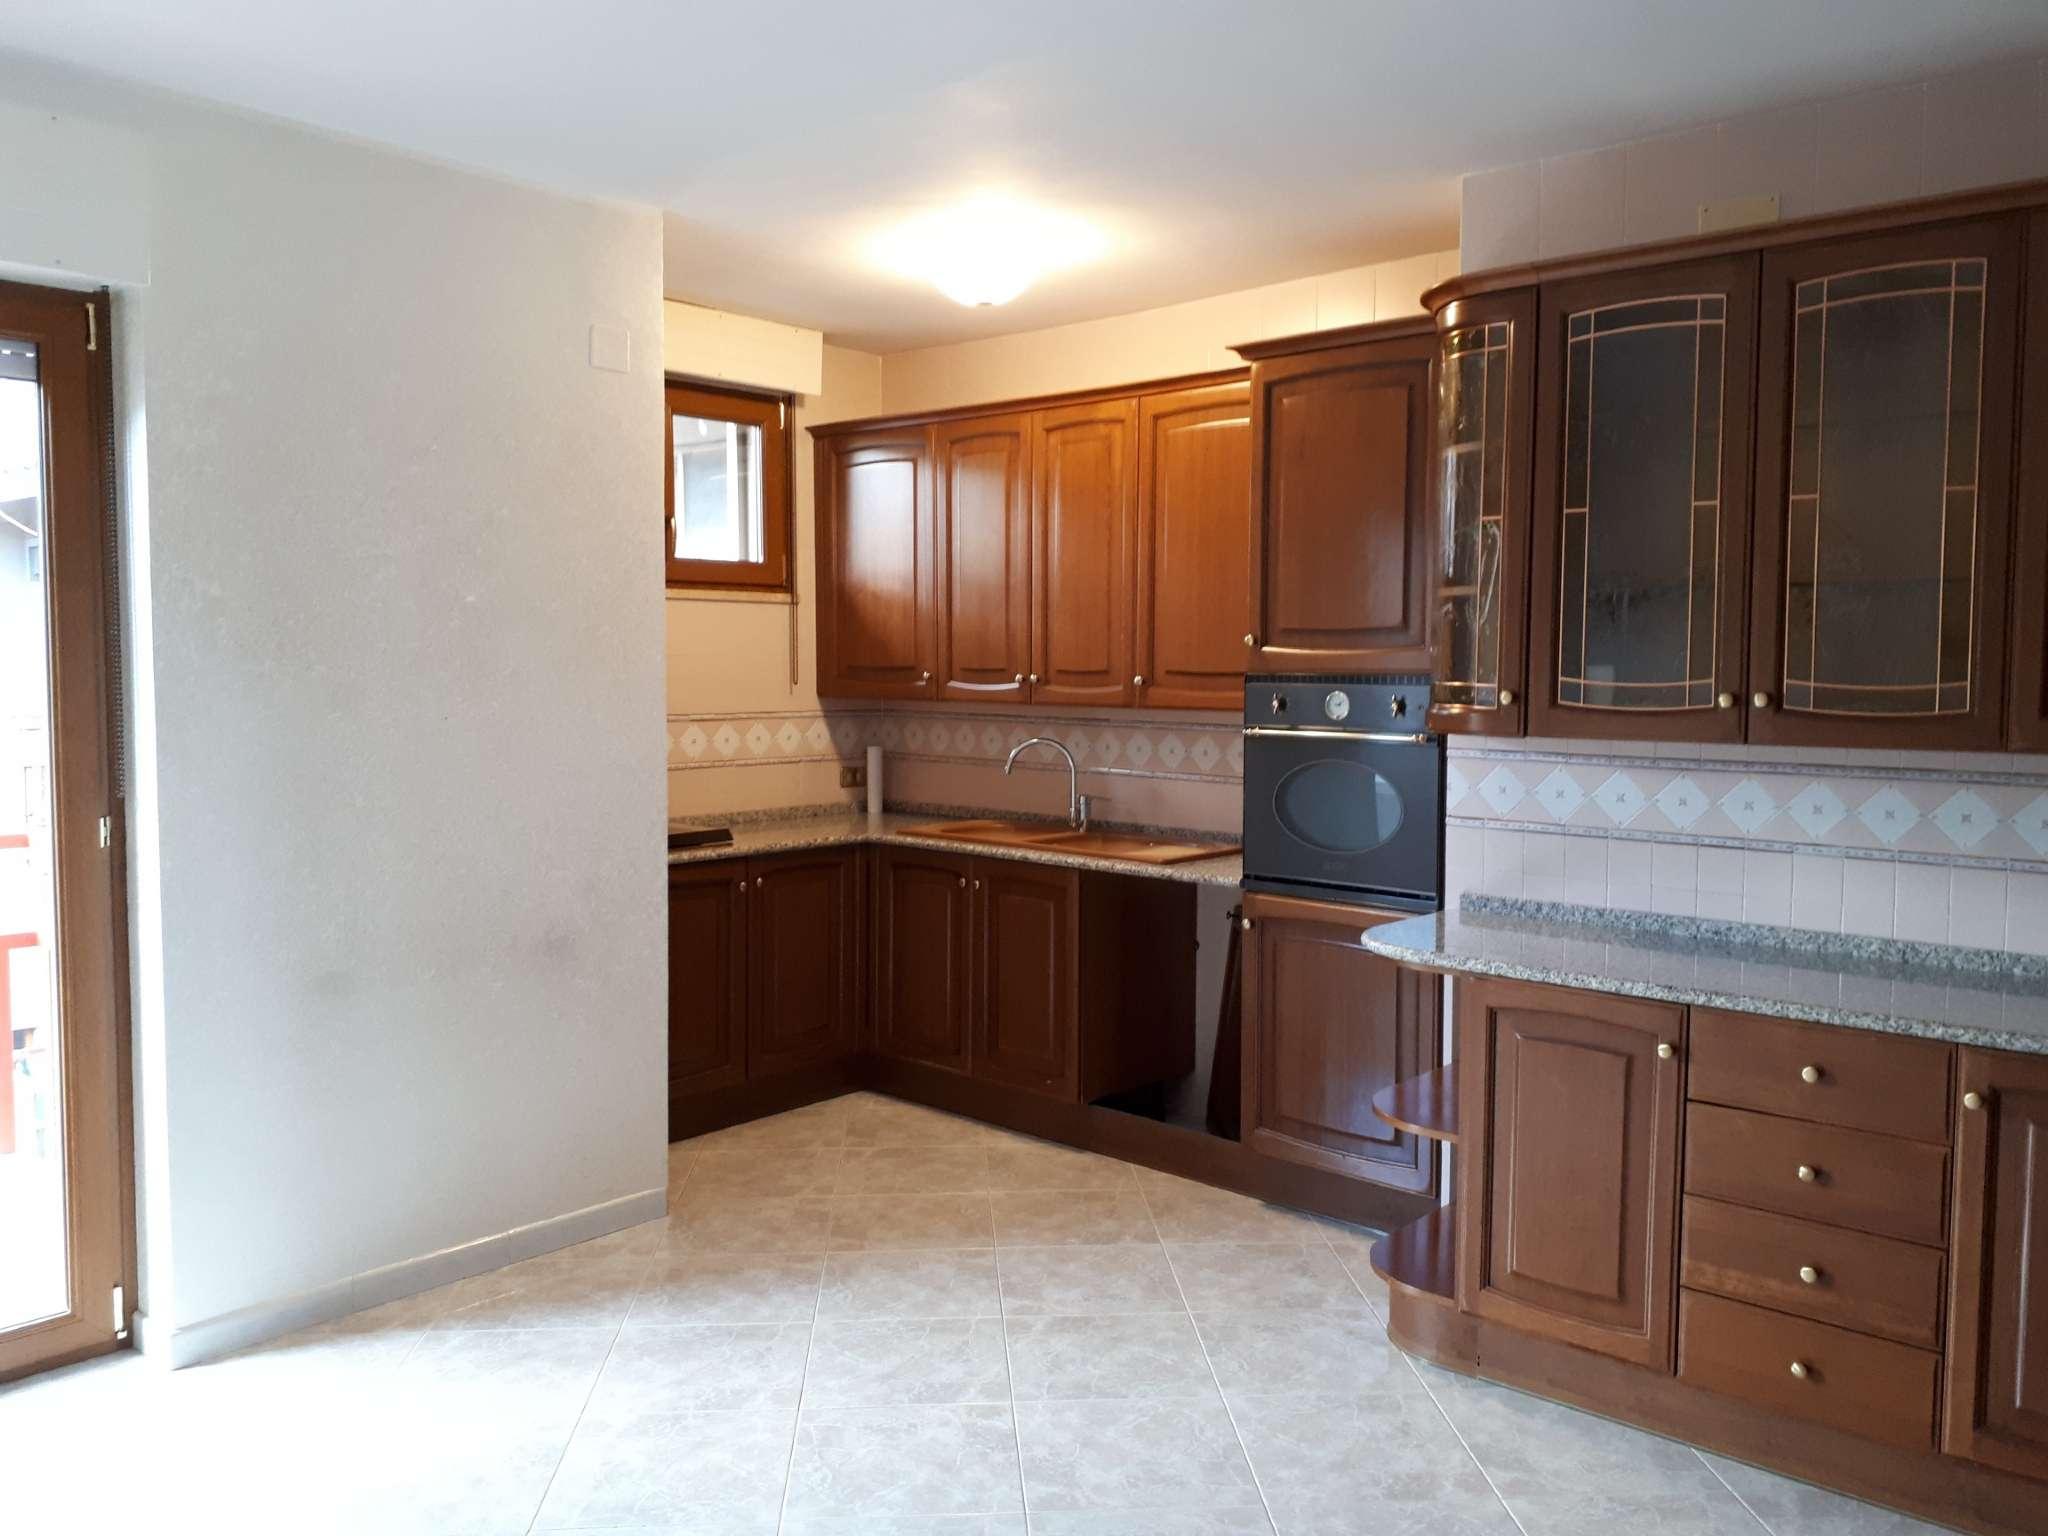 Via Tiberio - Campobasso, appartamento 4° piano